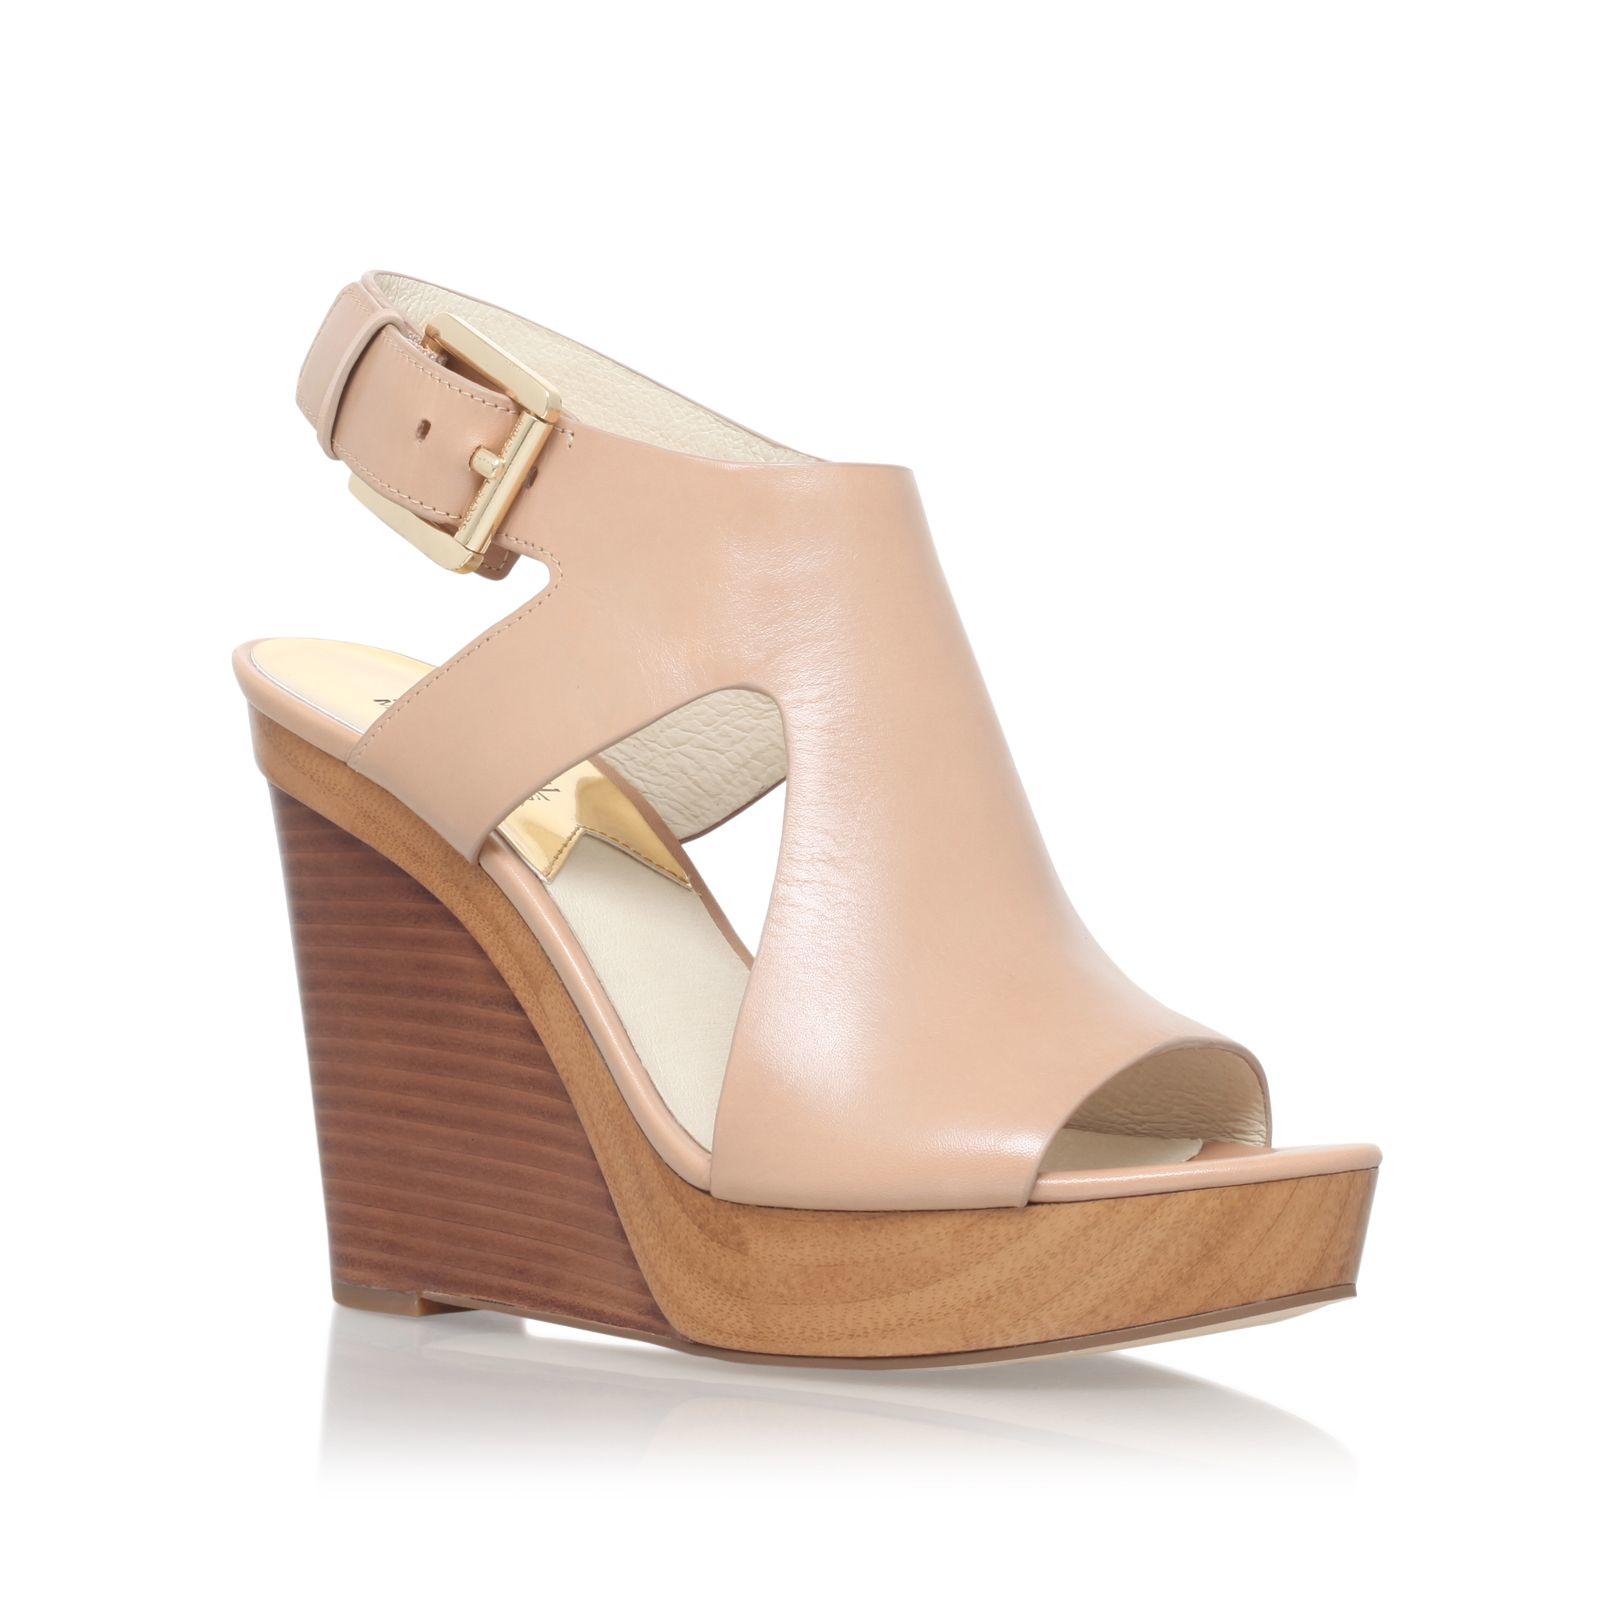 michael kors josephine high heel wedge sandals in natural. Black Bedroom Furniture Sets. Home Design Ideas